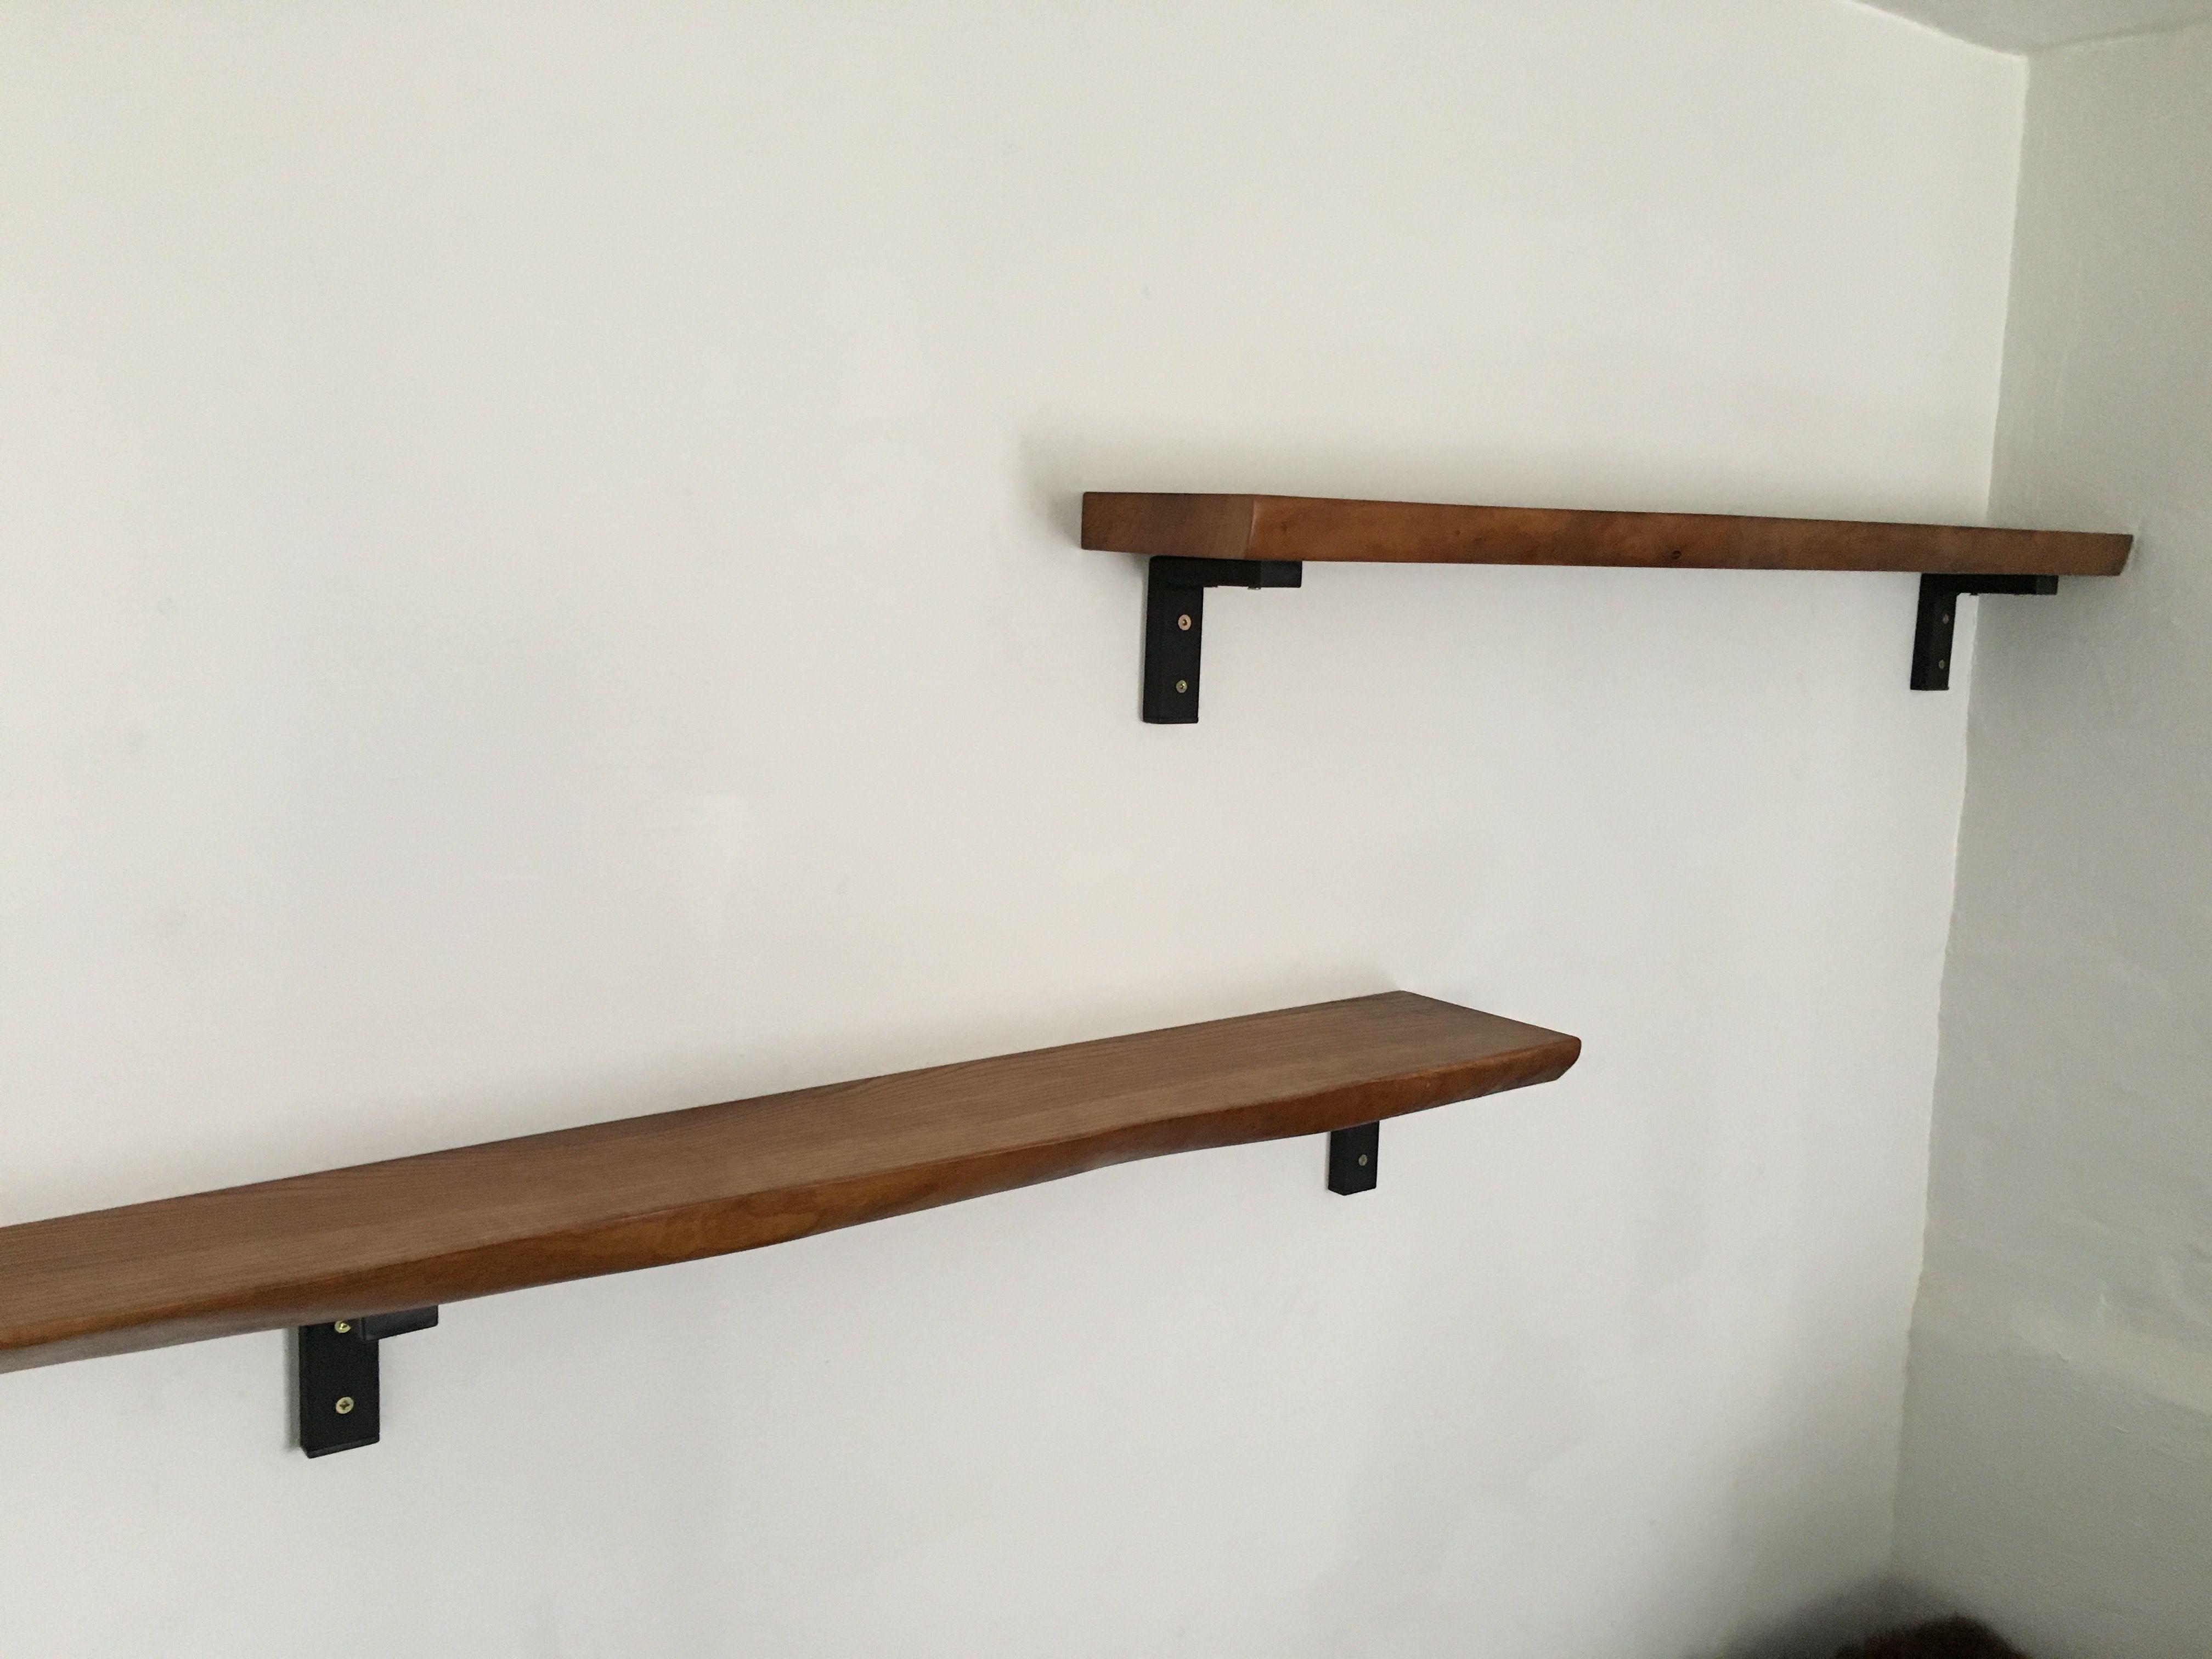 Shelfs #VintageKBH #Vintage #KBH #Industri #Industrielt ...